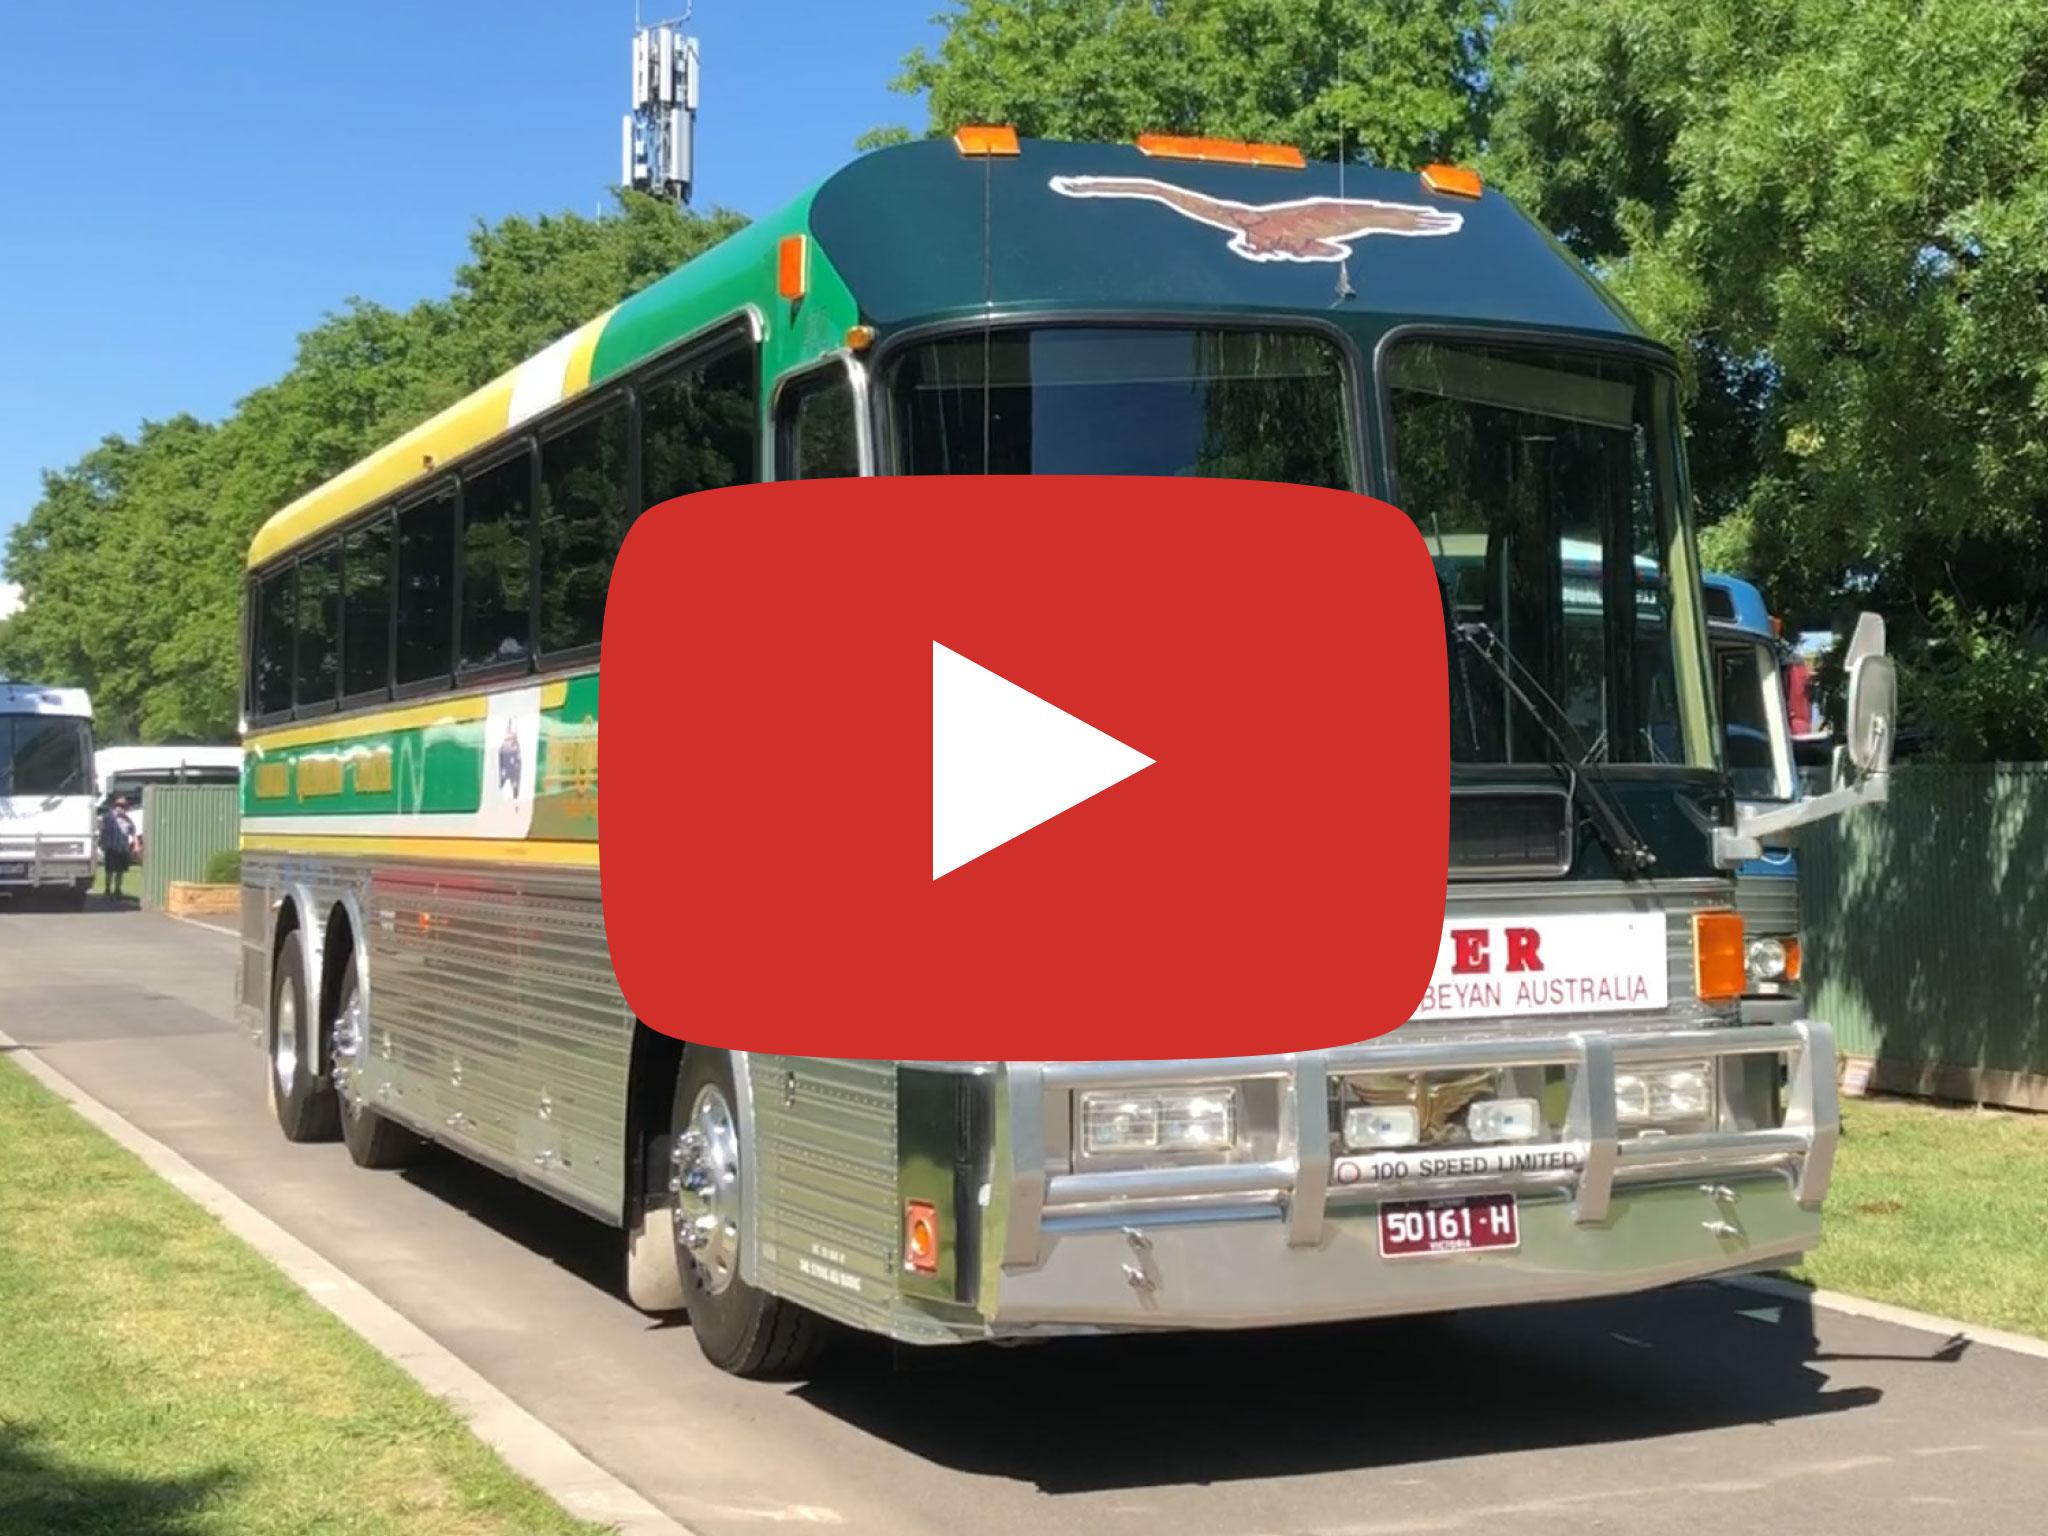 Eagle Model 20 Bus, 1989 version, Yarra Glen, Australia. Video taken November 2018.